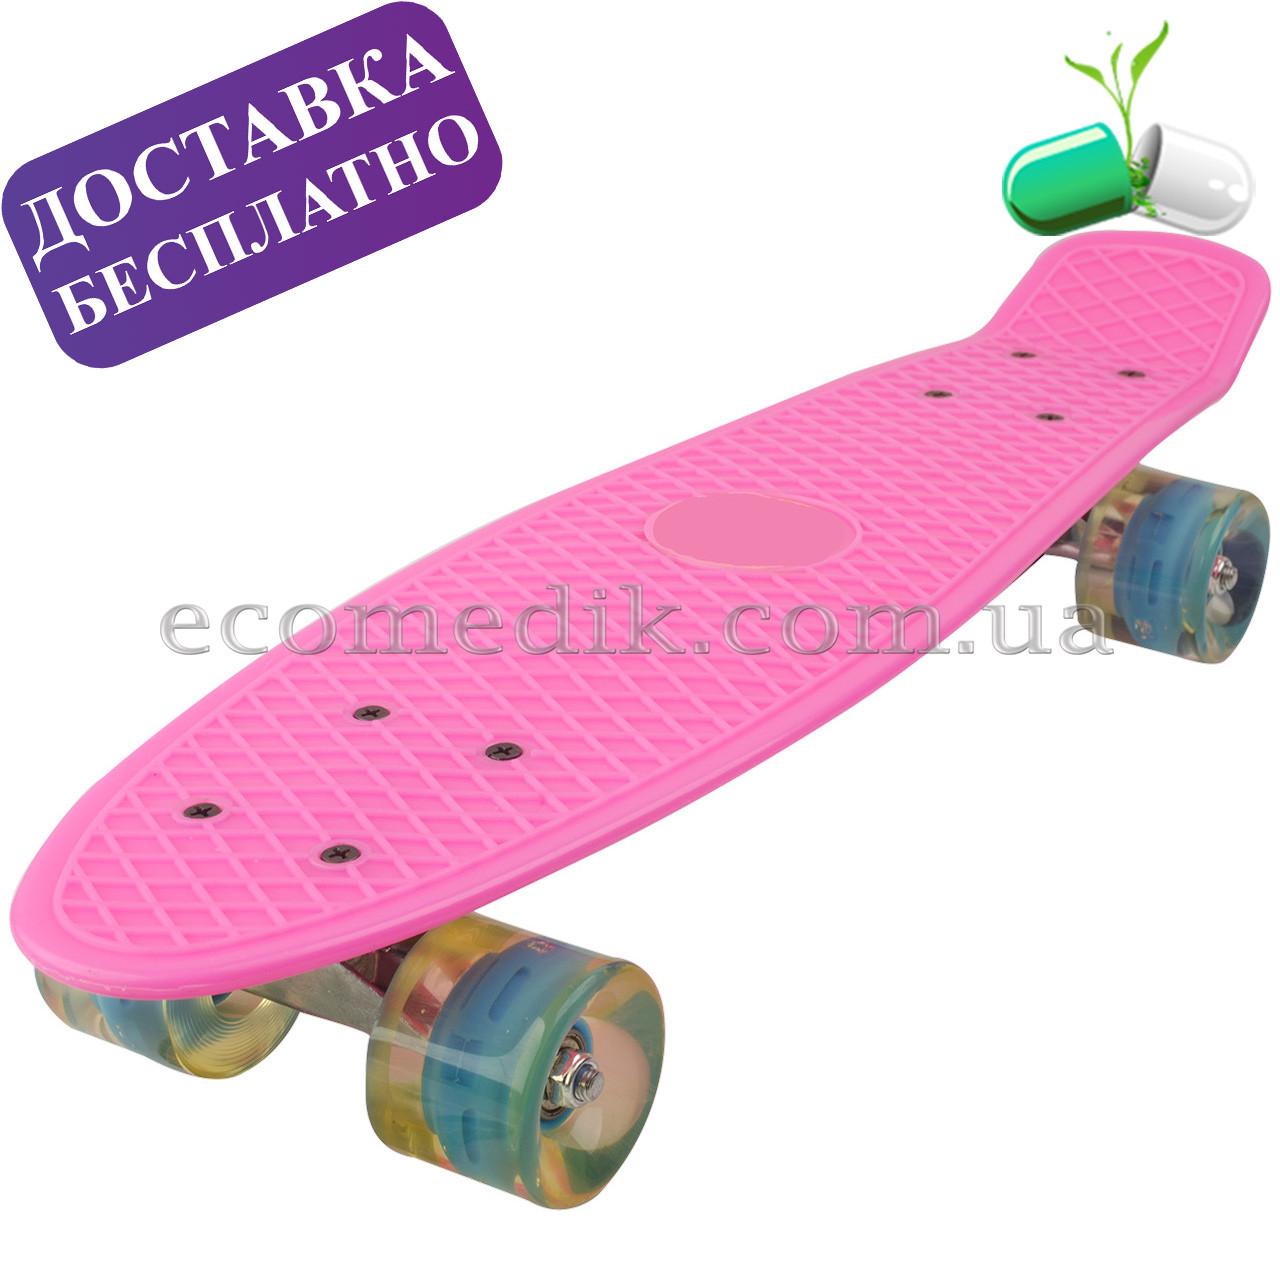 Ярко-розовый пенни борд со светящимися колесами penny board круизер